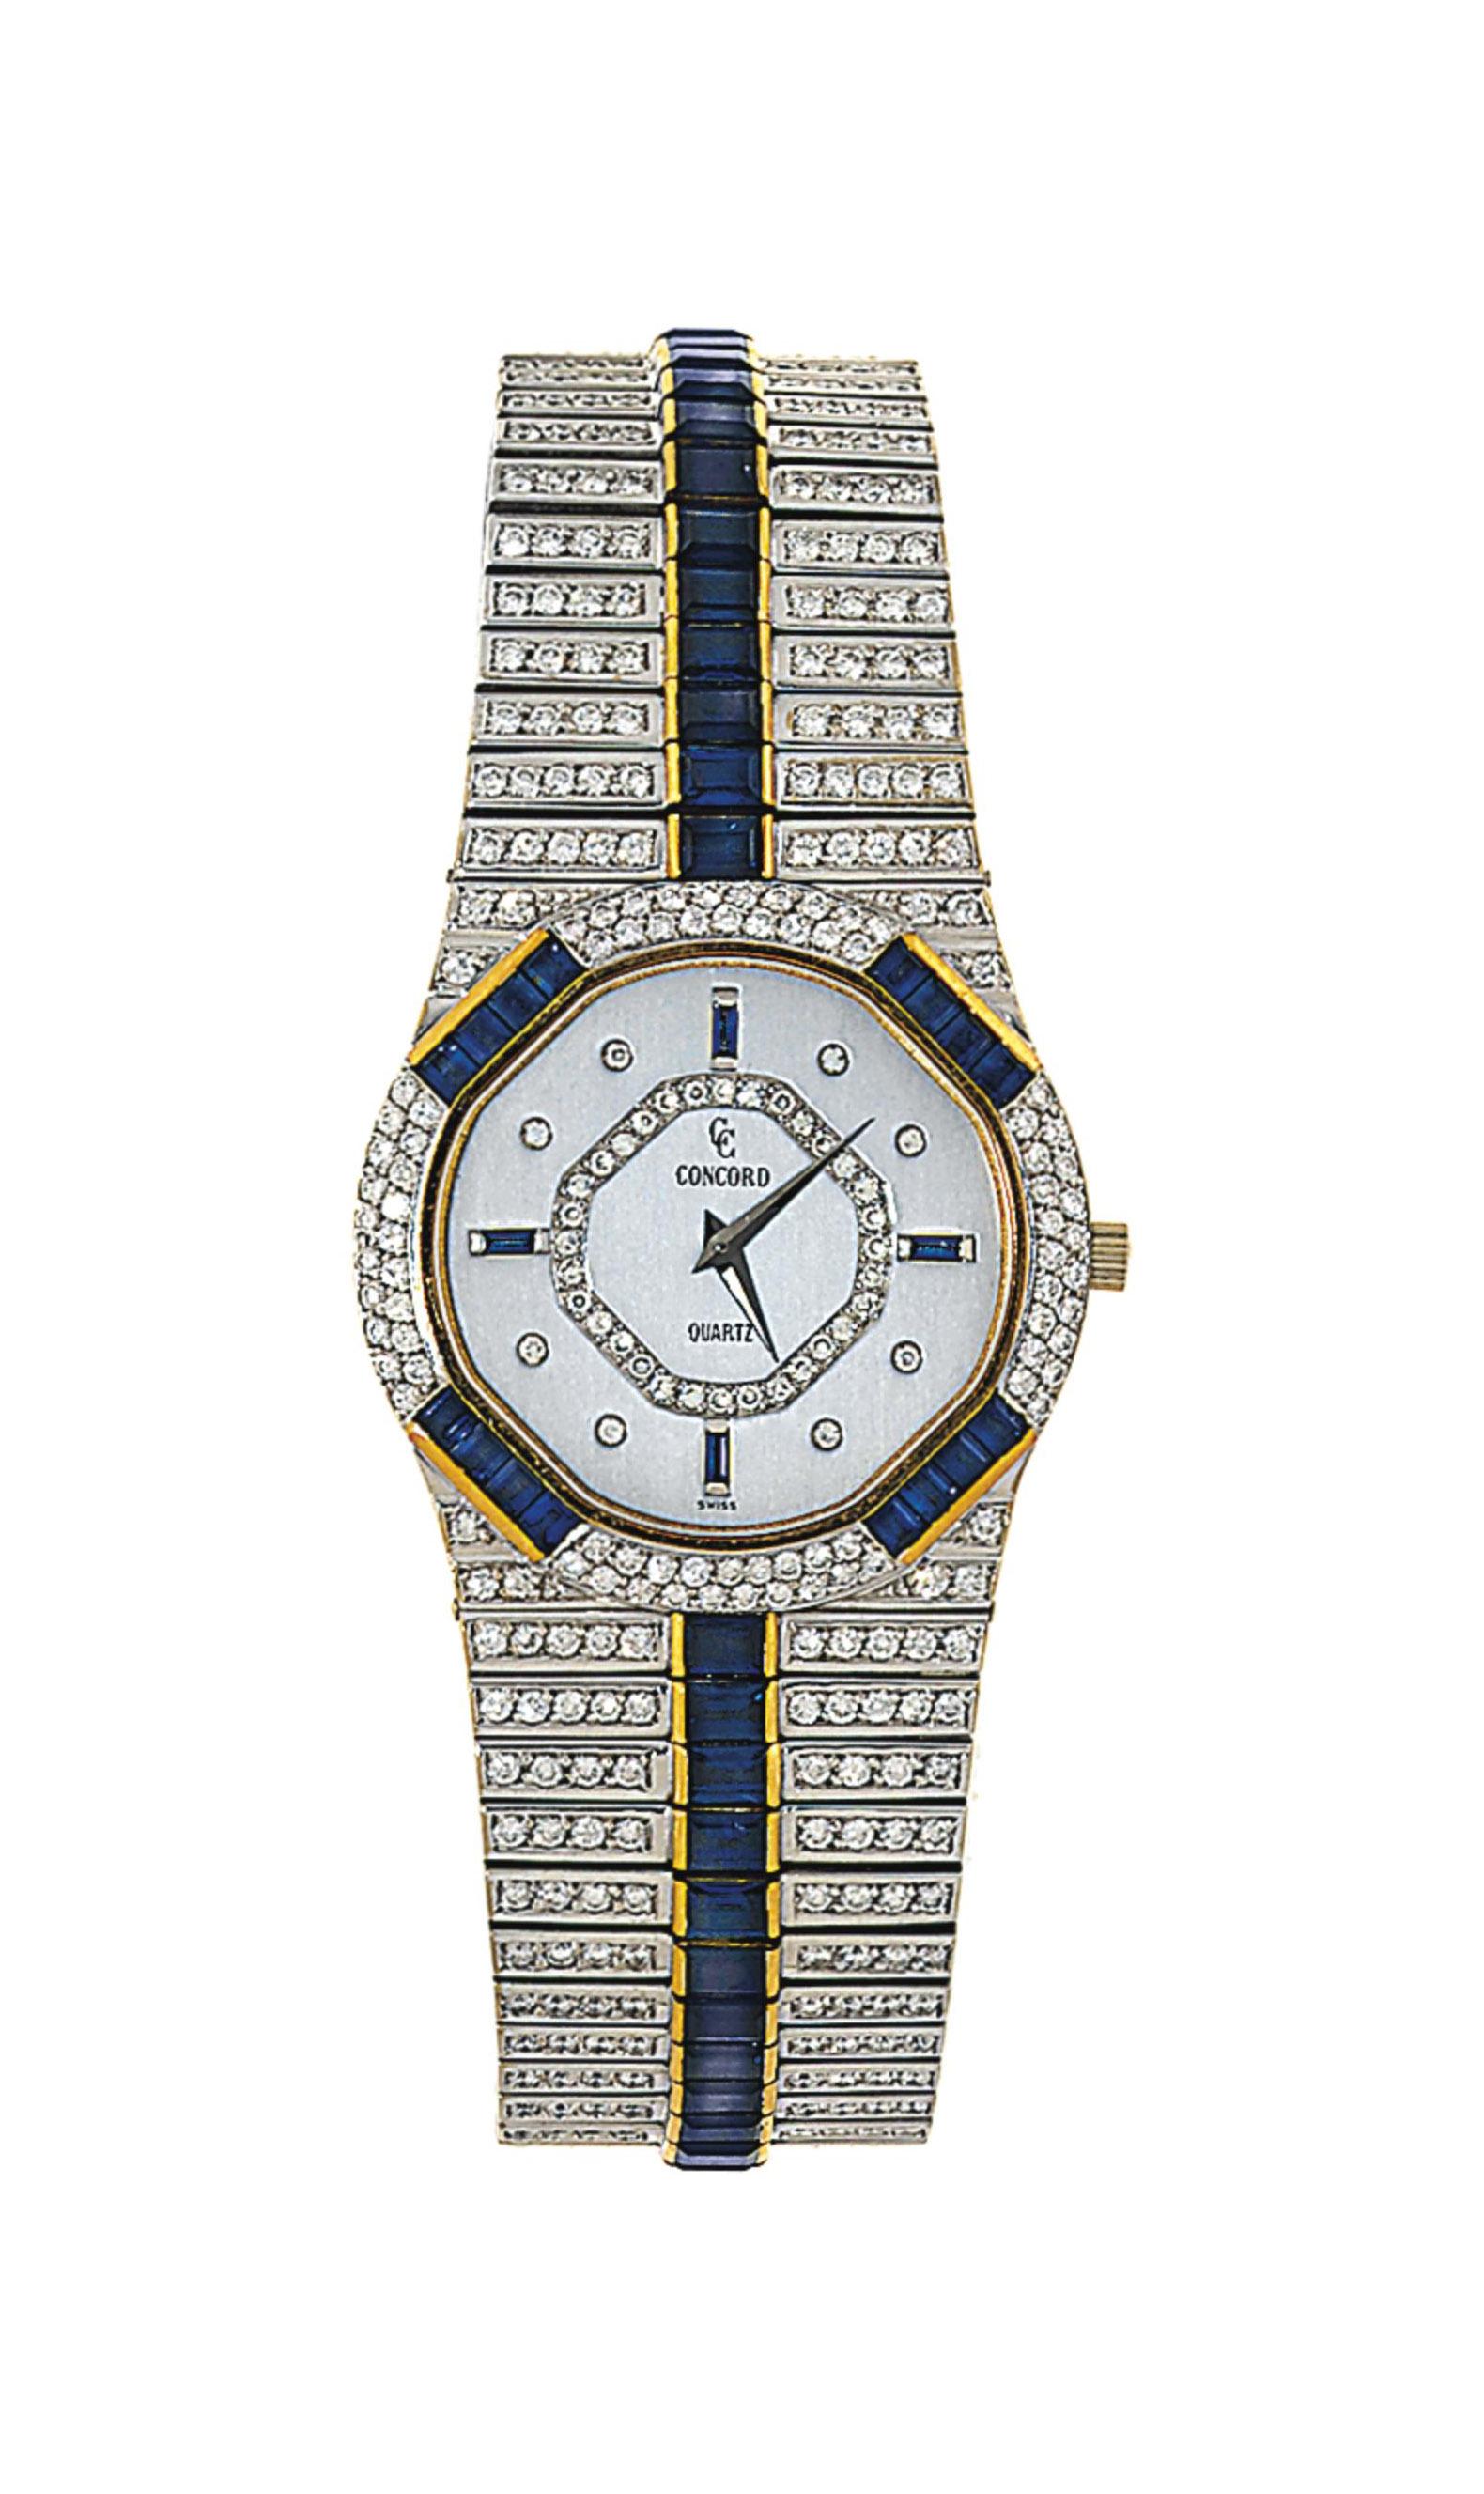 A sapphire and diamond-set quartz wristwatch, by Concord